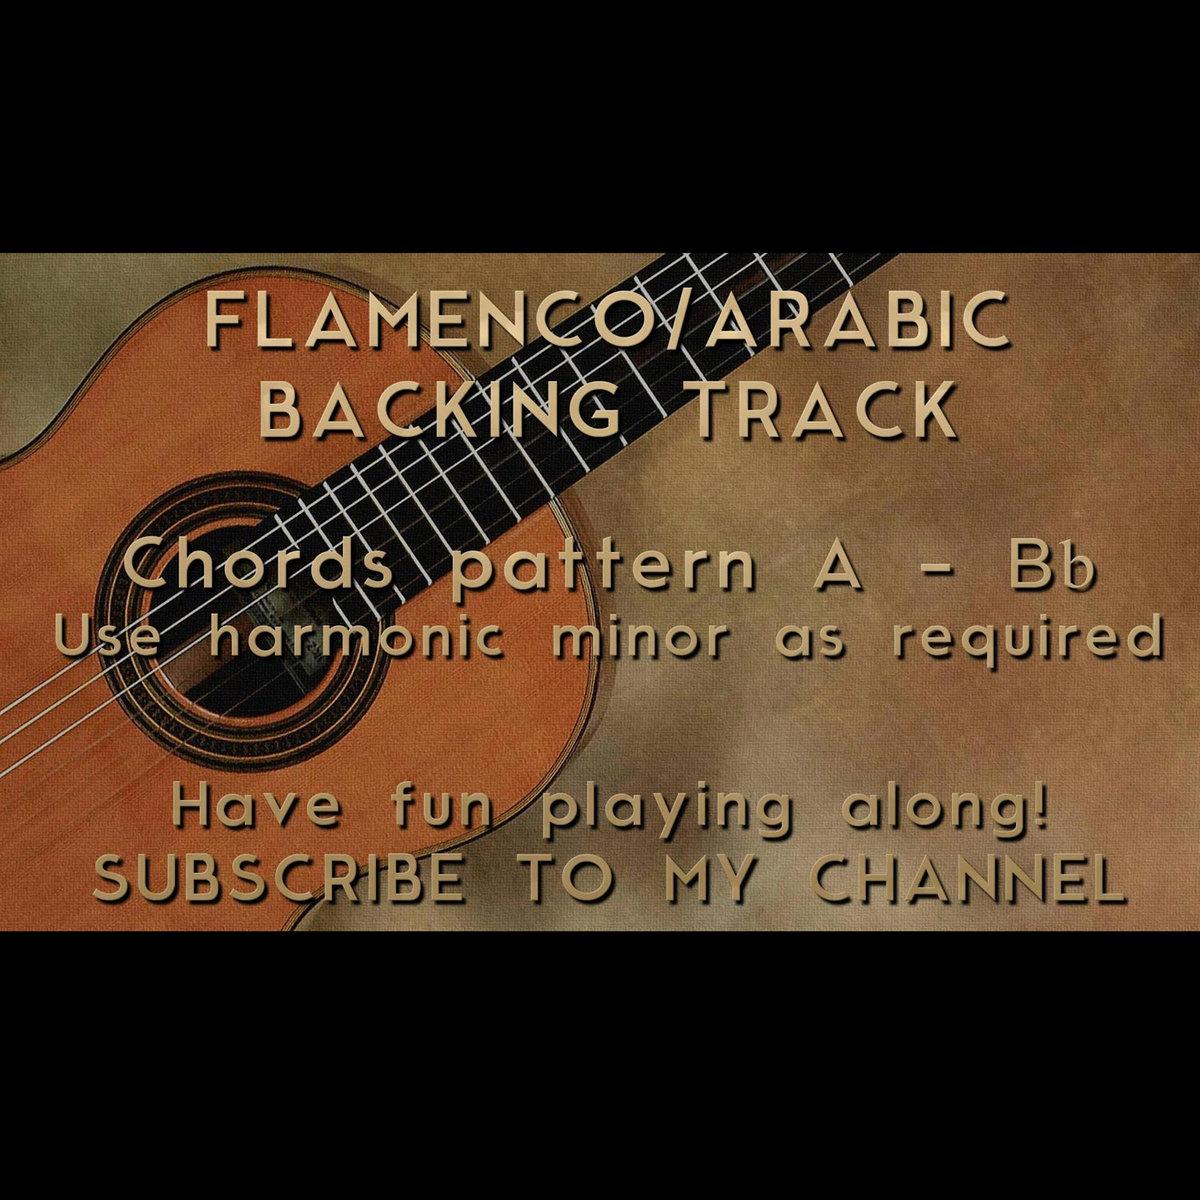 Backing Track Flamenco Arabic Harmonic Minor A Bb Nick Neblo